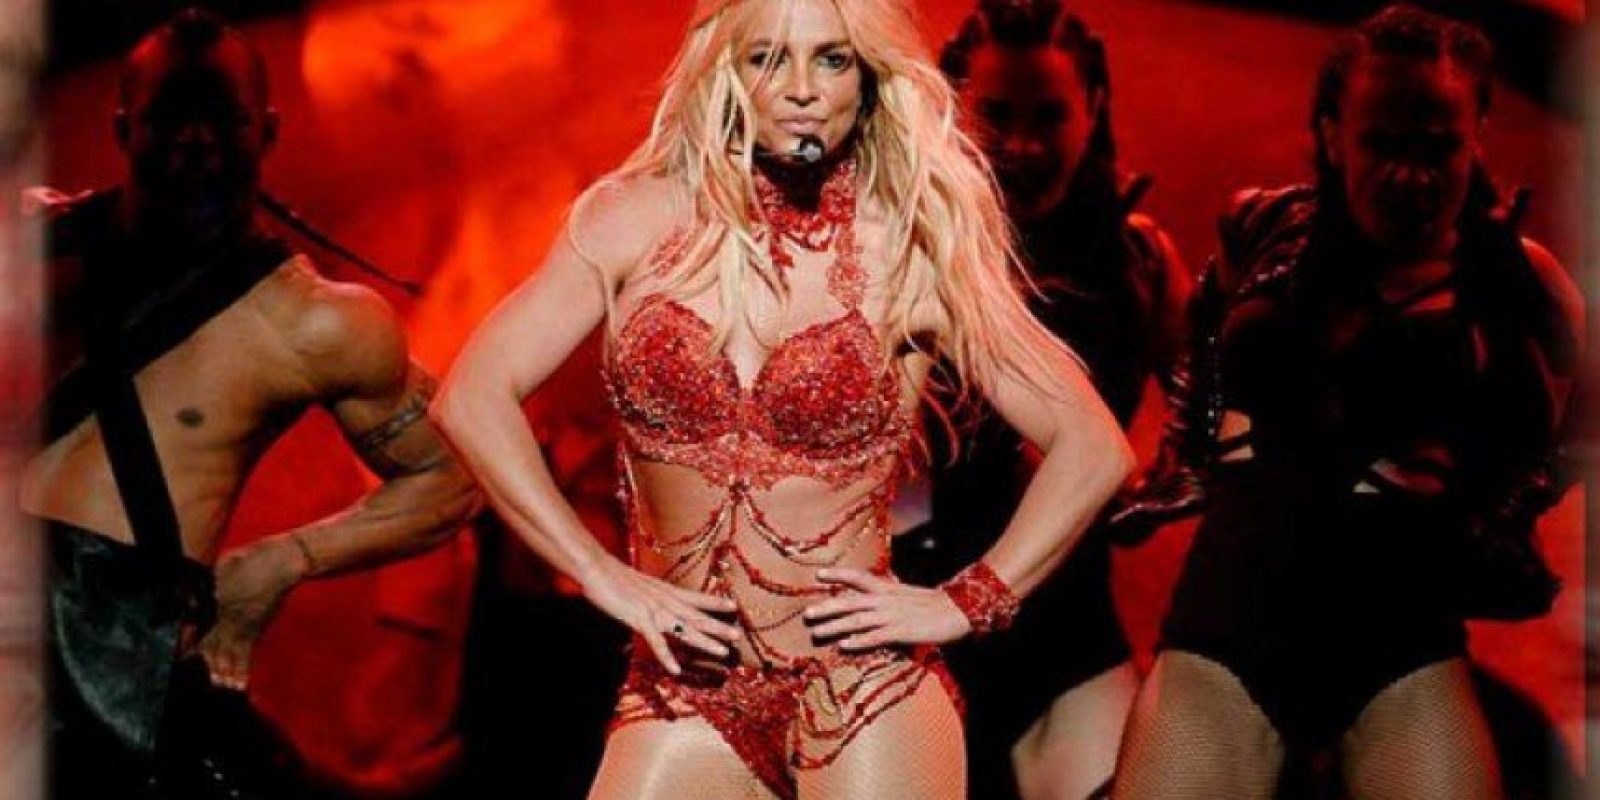 La hermosa pareja que formaban Britney Spears y Justin Timberlake terminó Foto:Internet